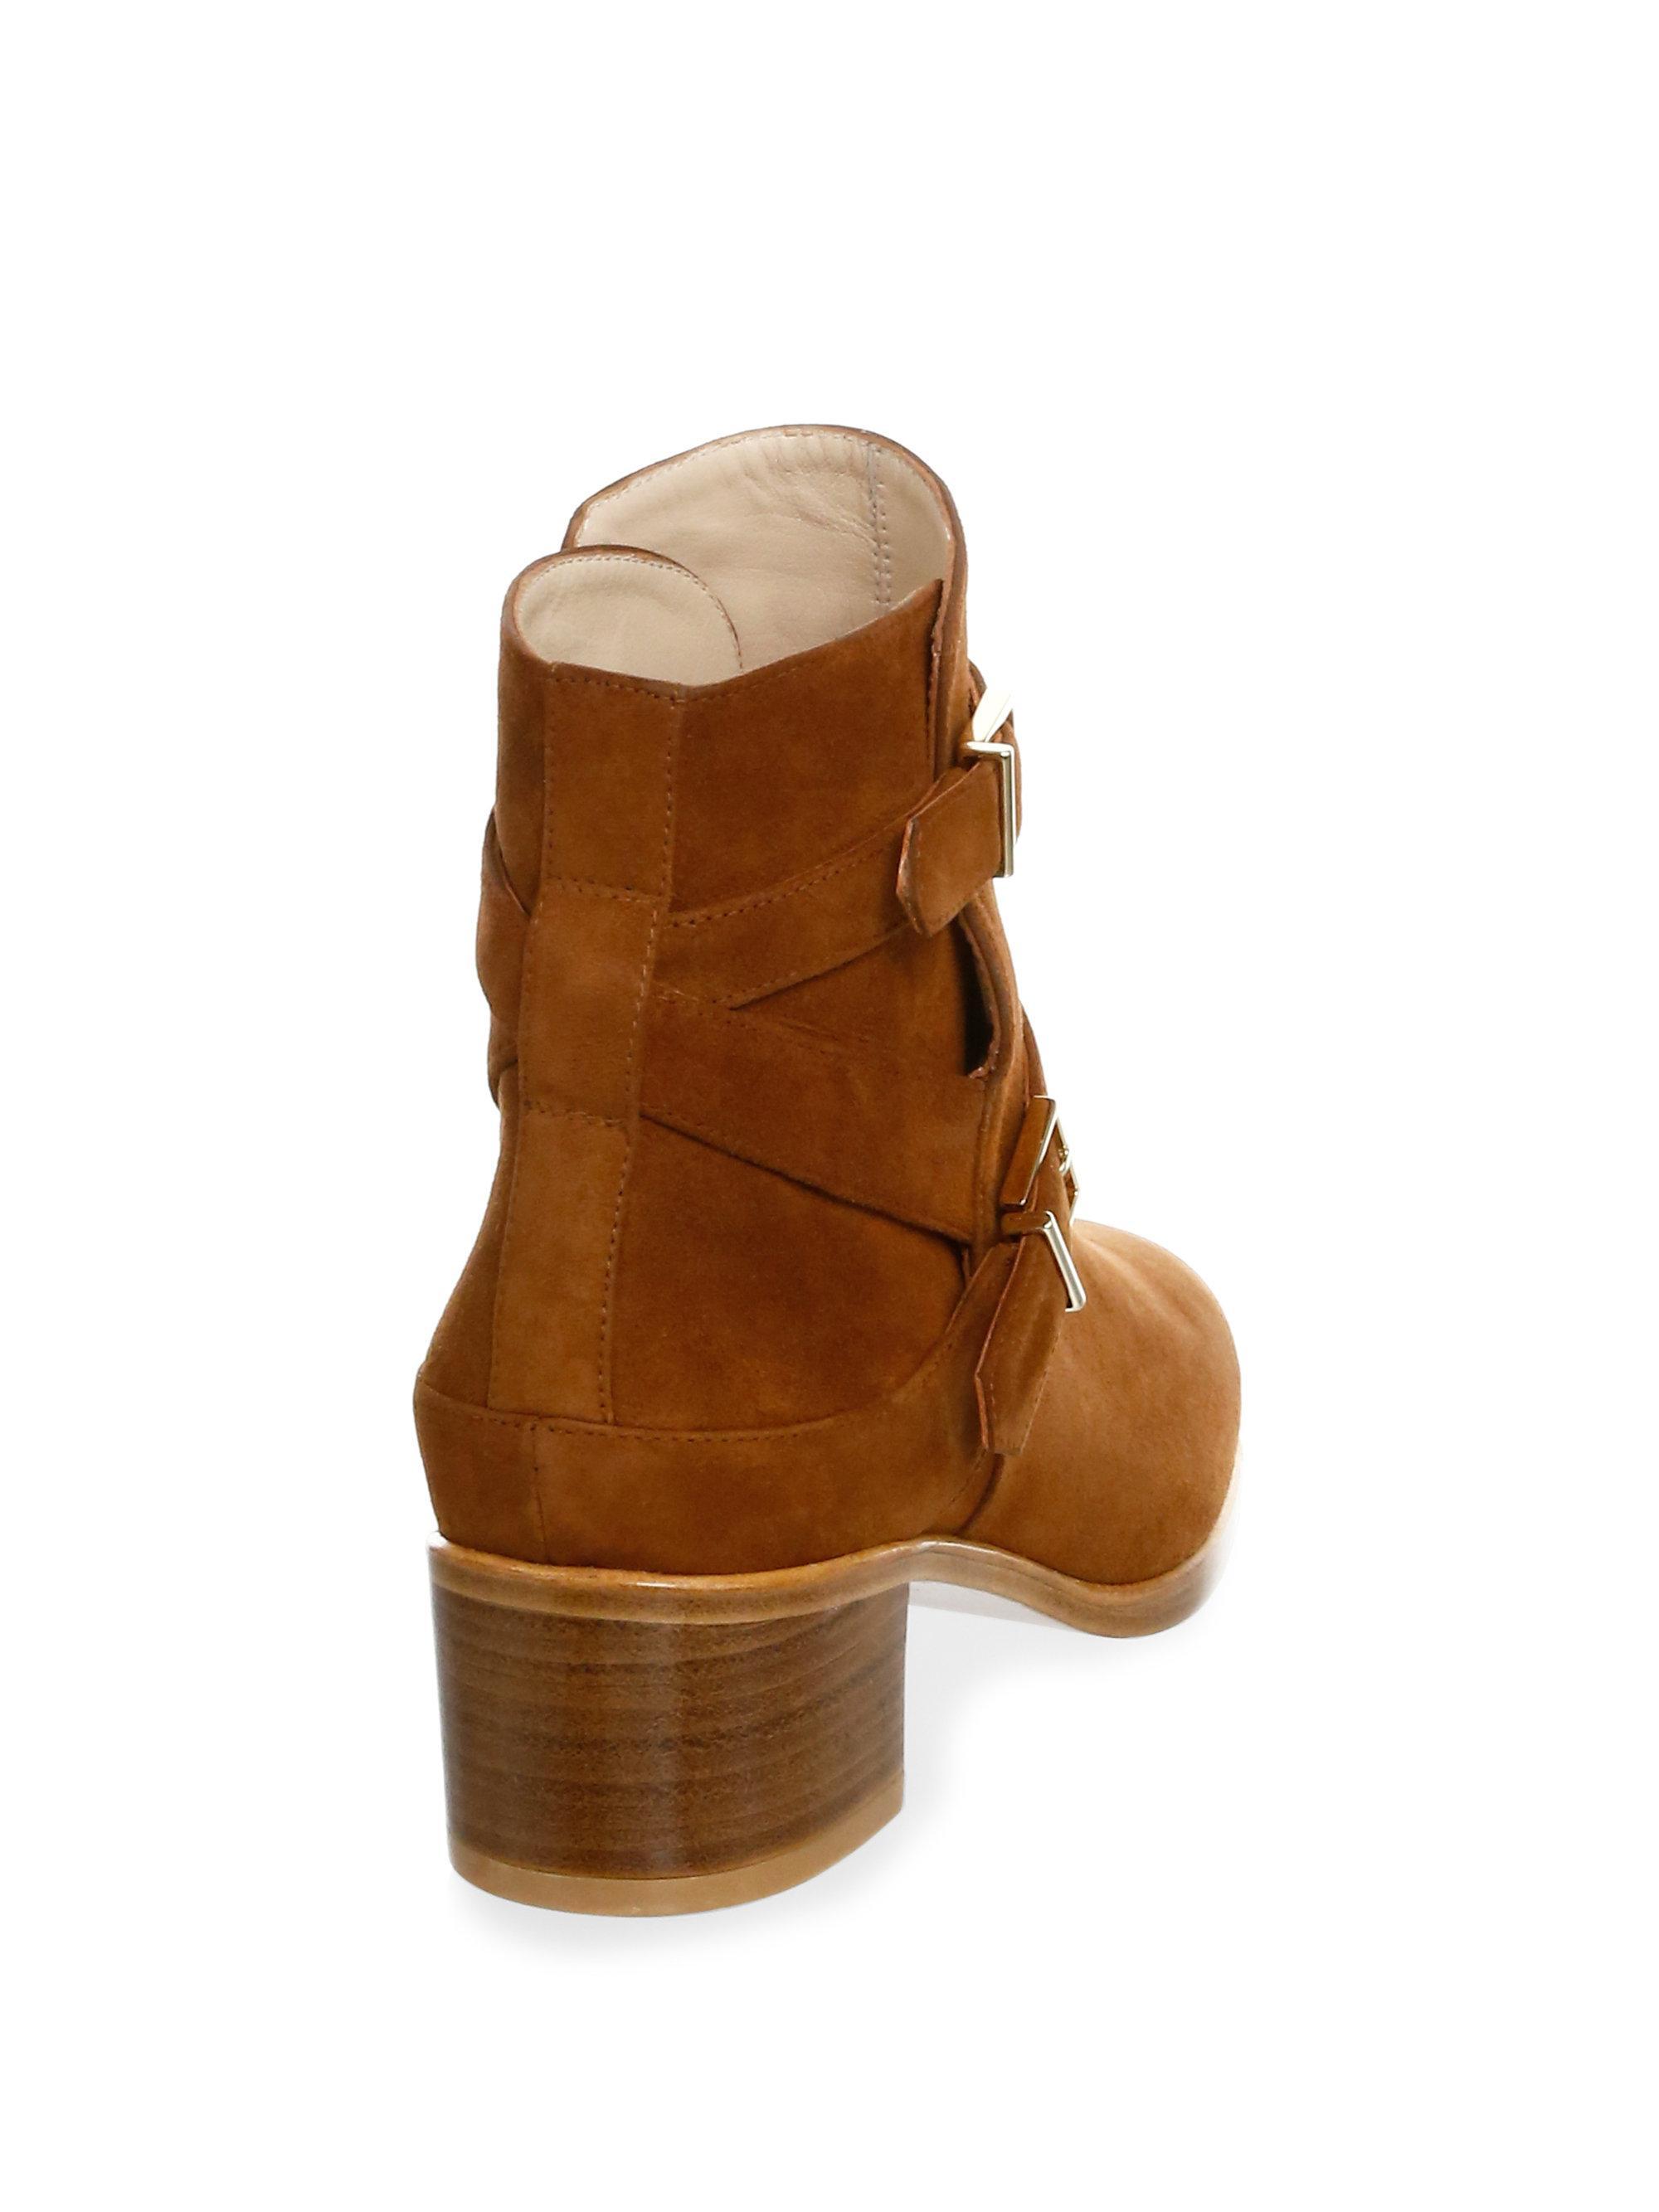 Stuart Weitzman Eastside Suede Ankle Boots CCwWK9XOTQ